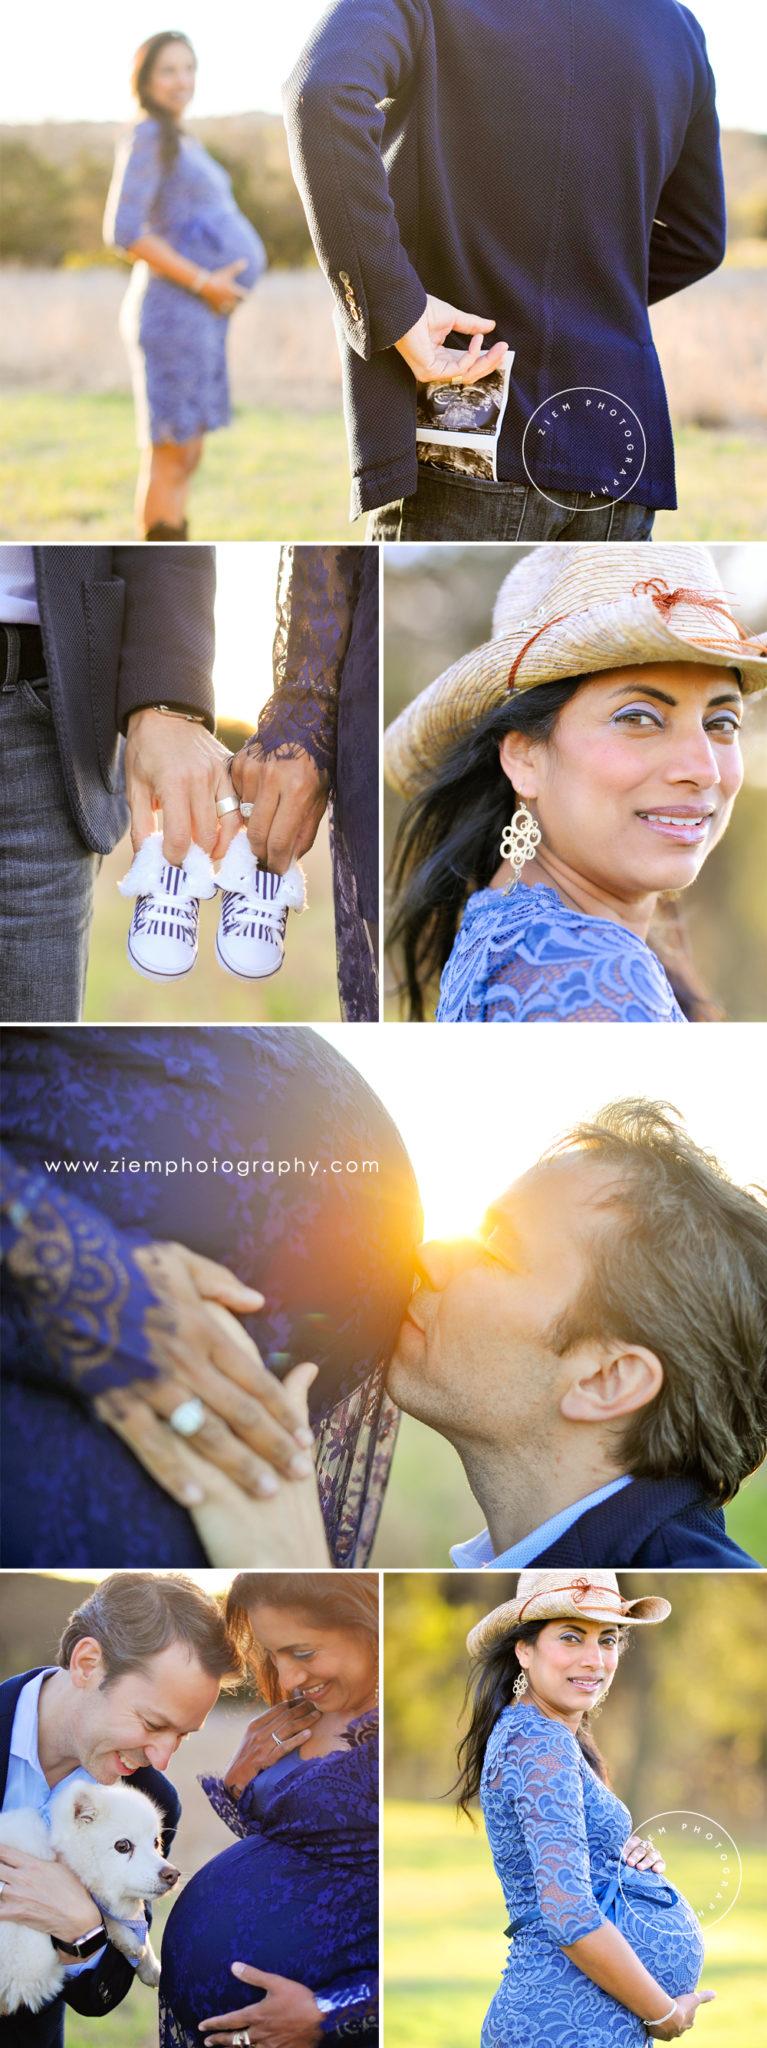 Austin Maternity Photography Shaw Newborn Photographers Ziem Photography